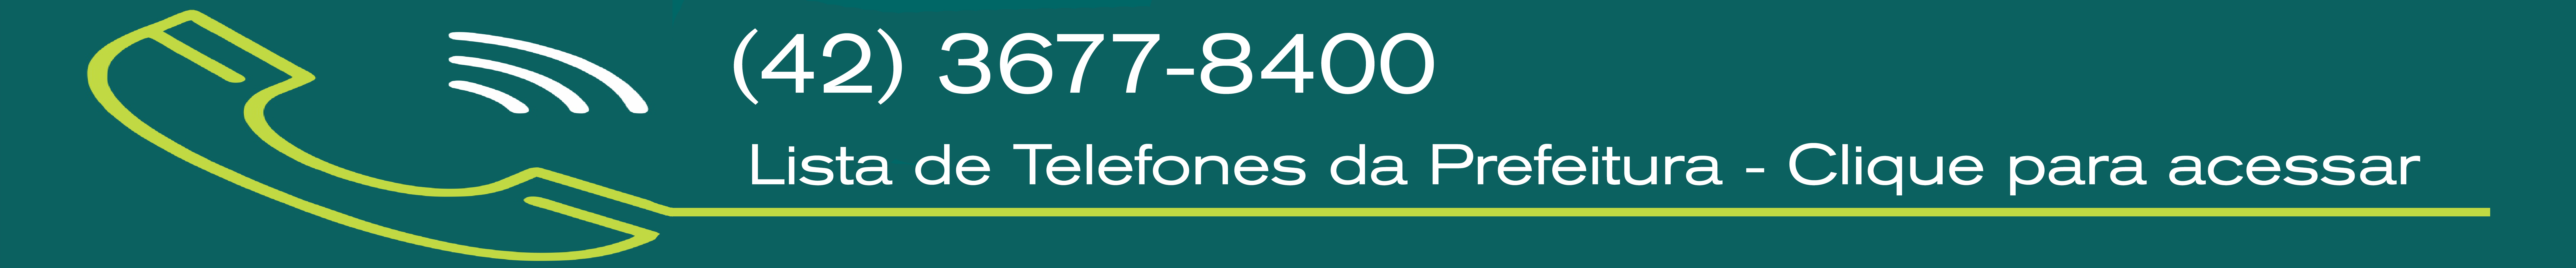 Telefones para contato